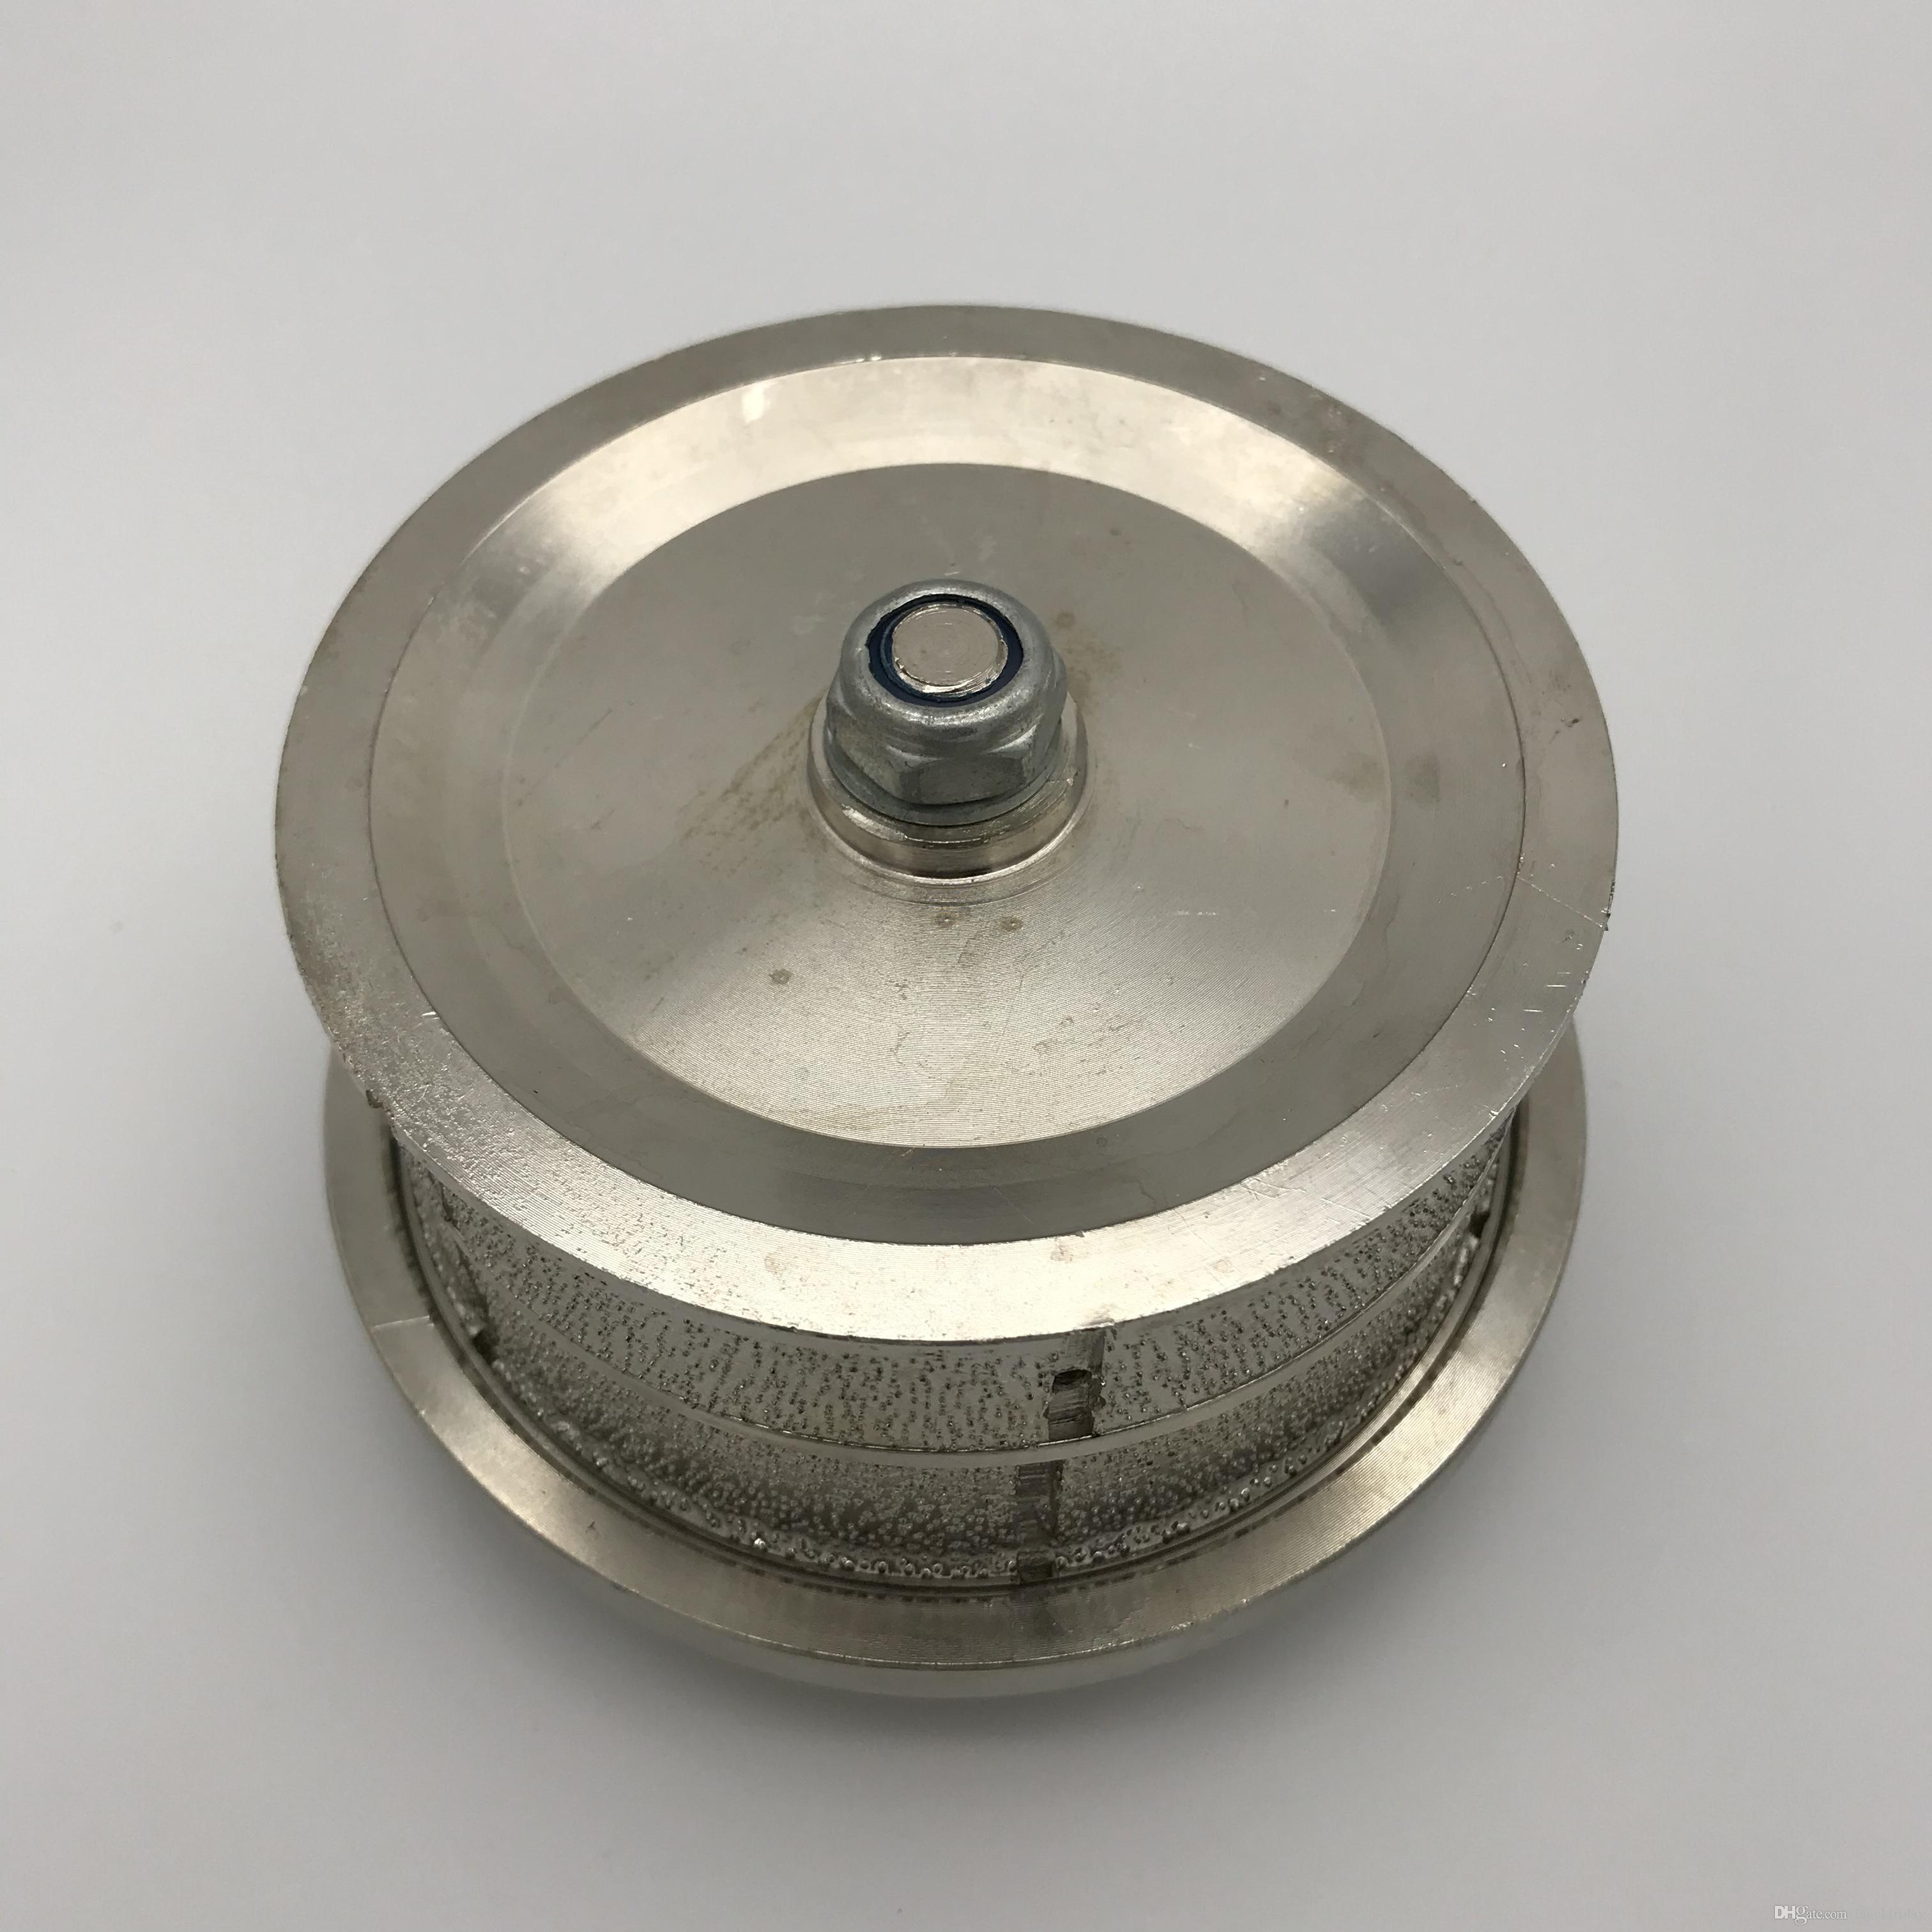 Vacuum Brazed Hand Profiler T40 for Granite Marble Limestone Profile Wheel Diamond Router Bit Thread M14 or 5/8-11